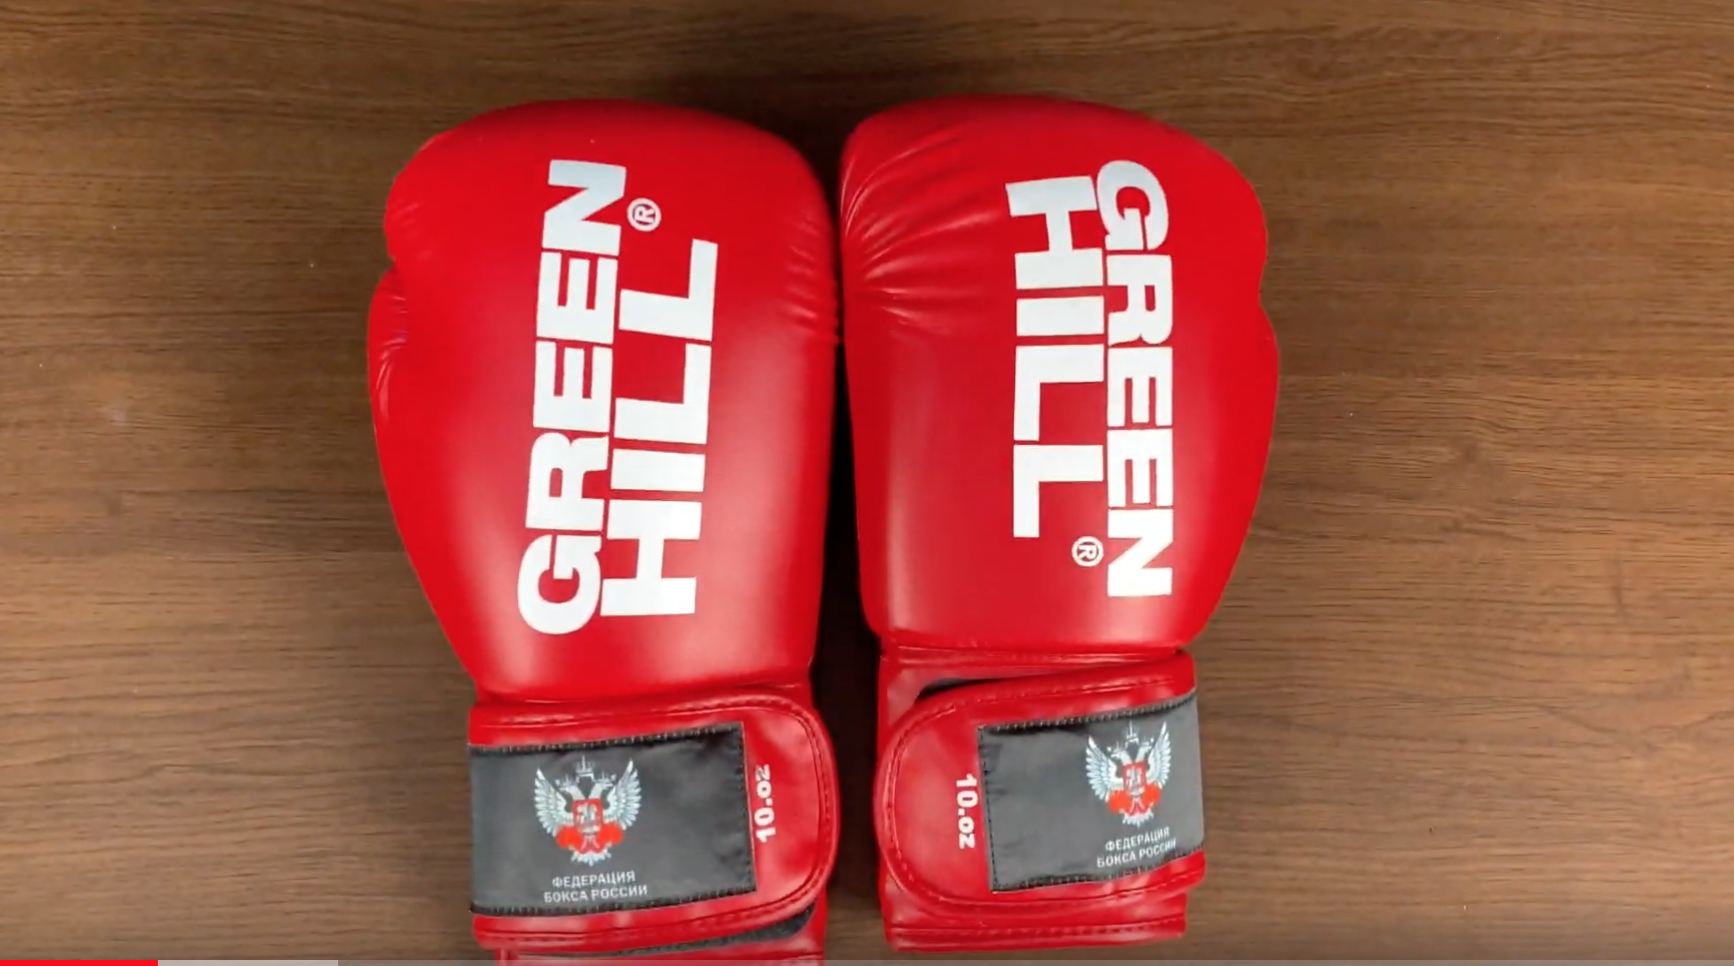 Обзор боксерских перчаток Green Hill. Модель REX